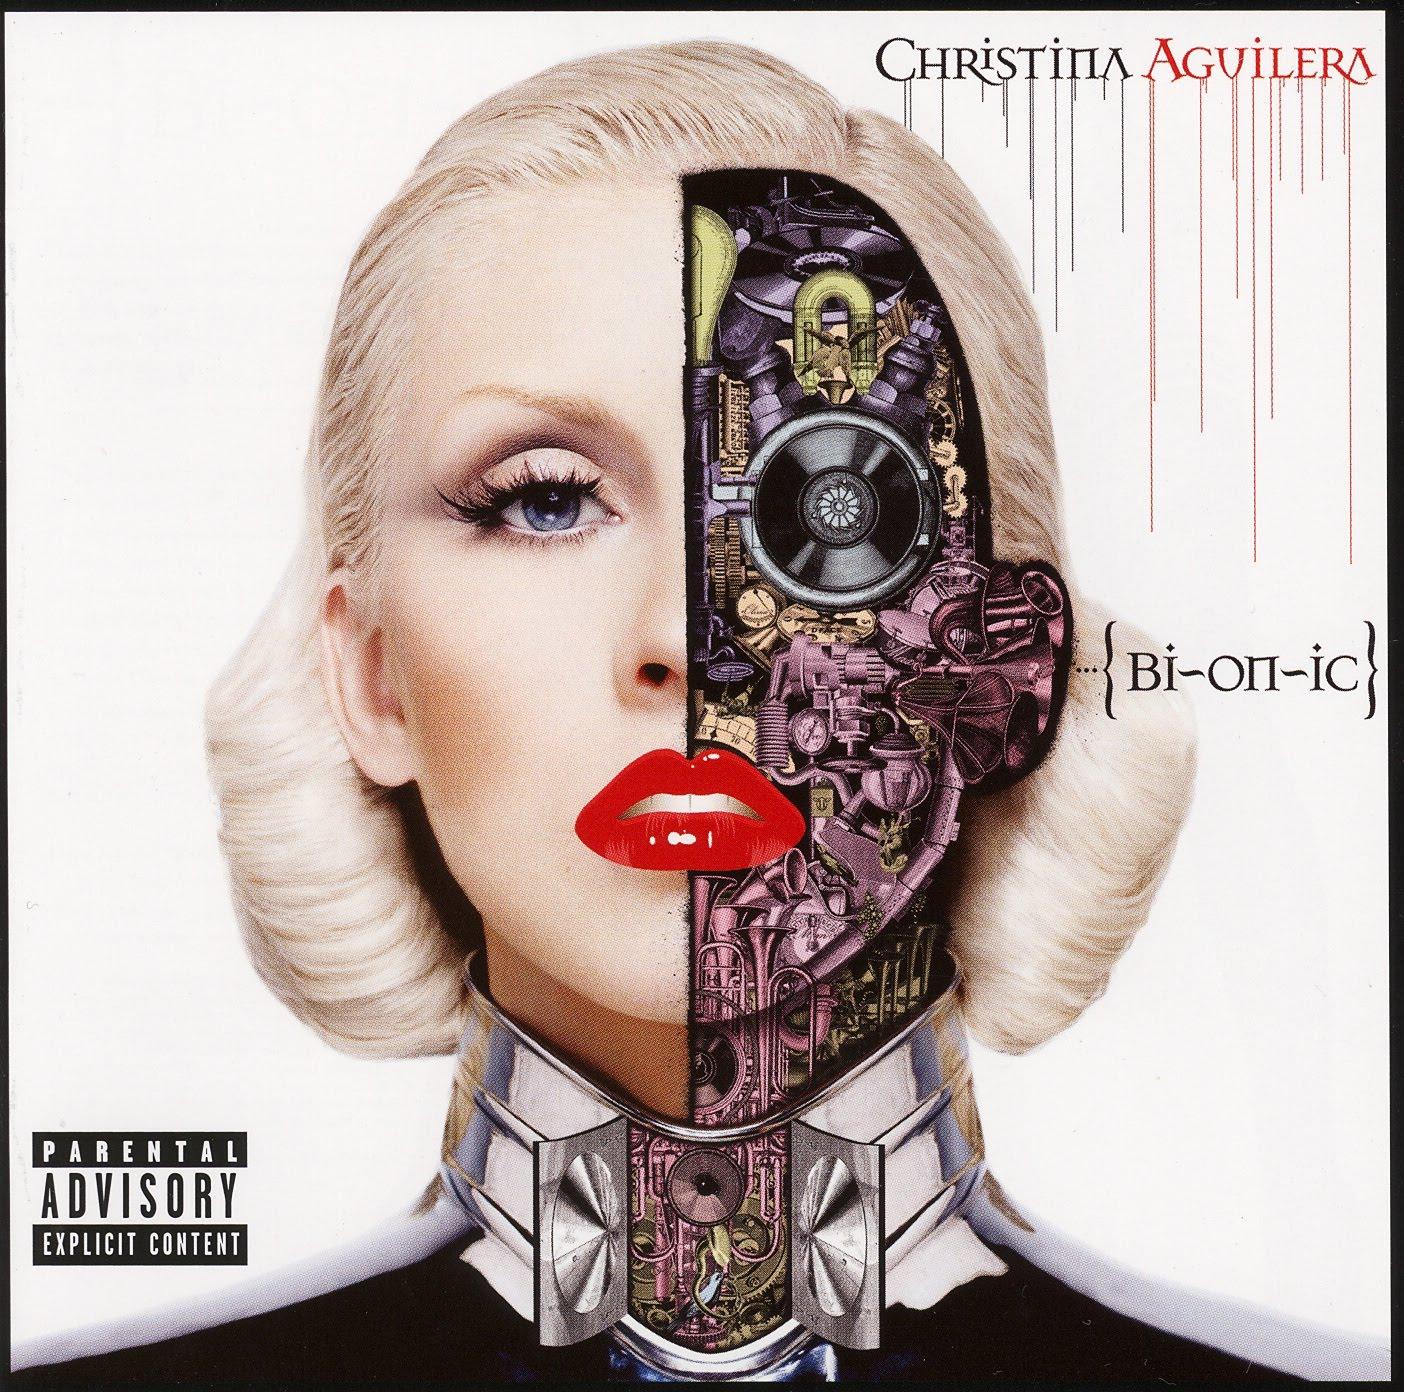 http://3.bp.blogspot.com/_swO1O7nE7JY/TEYMh69nZeI/AAAAAAAABos/1hcwRzPooPI/s1600/Christina+Aguilera+-+Bionic.jpg